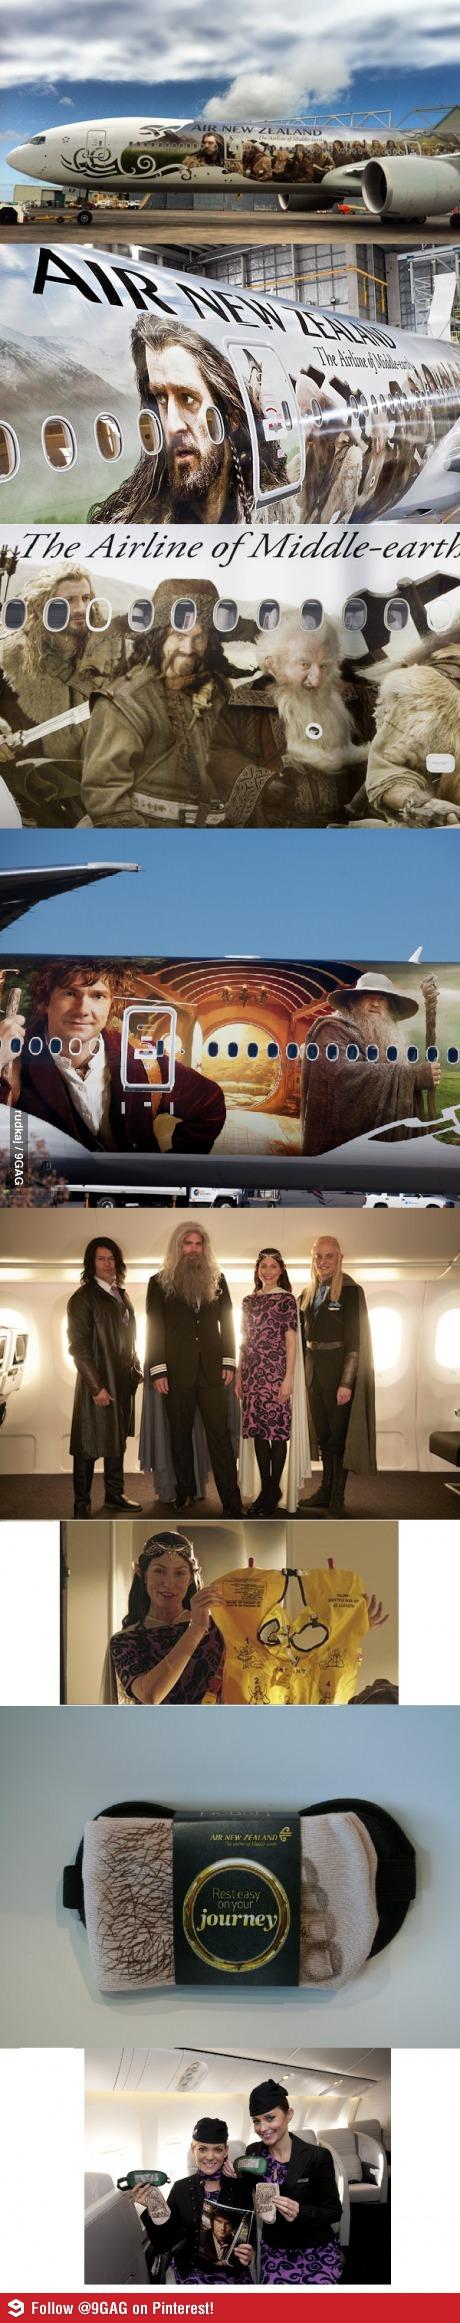 New Zealand airlines goes in Hobbit-style Best idea ever!! @Valorraine Dattan